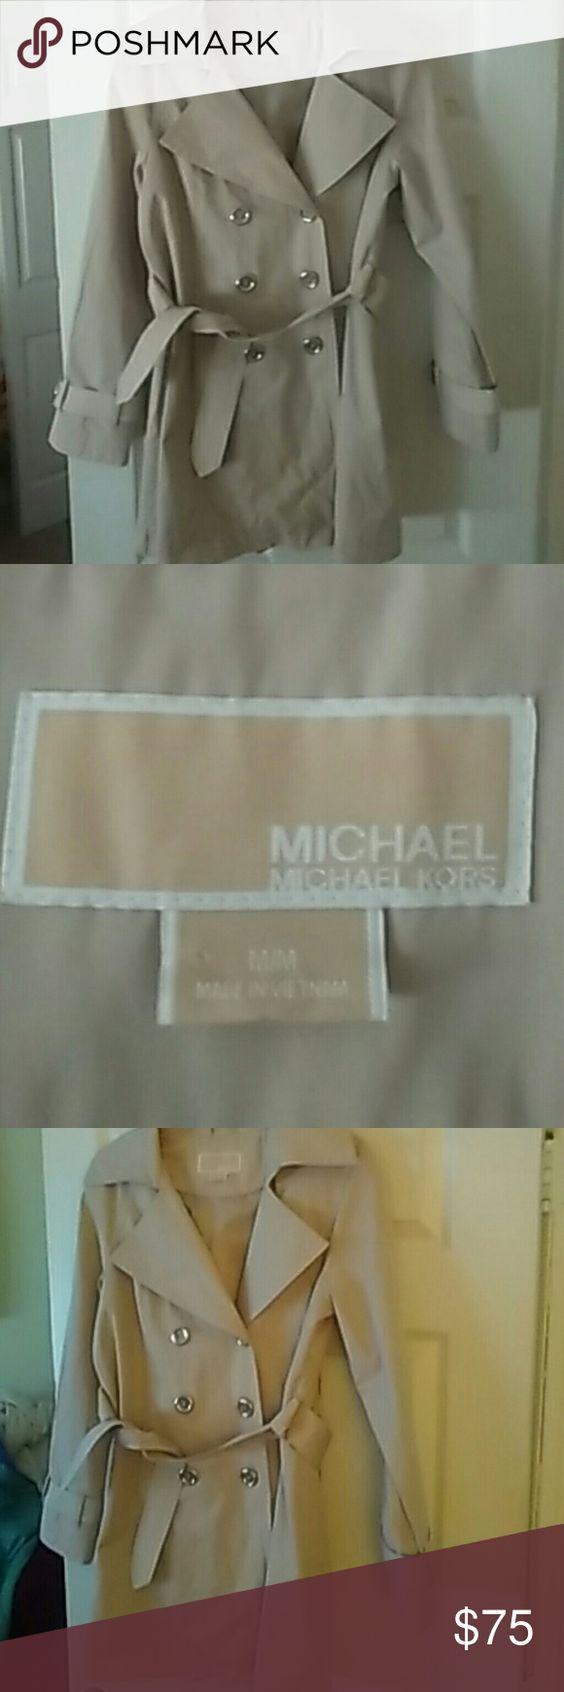 Selling this Michael Kors tan Trench Coat sz M on Poshmark! My username is…